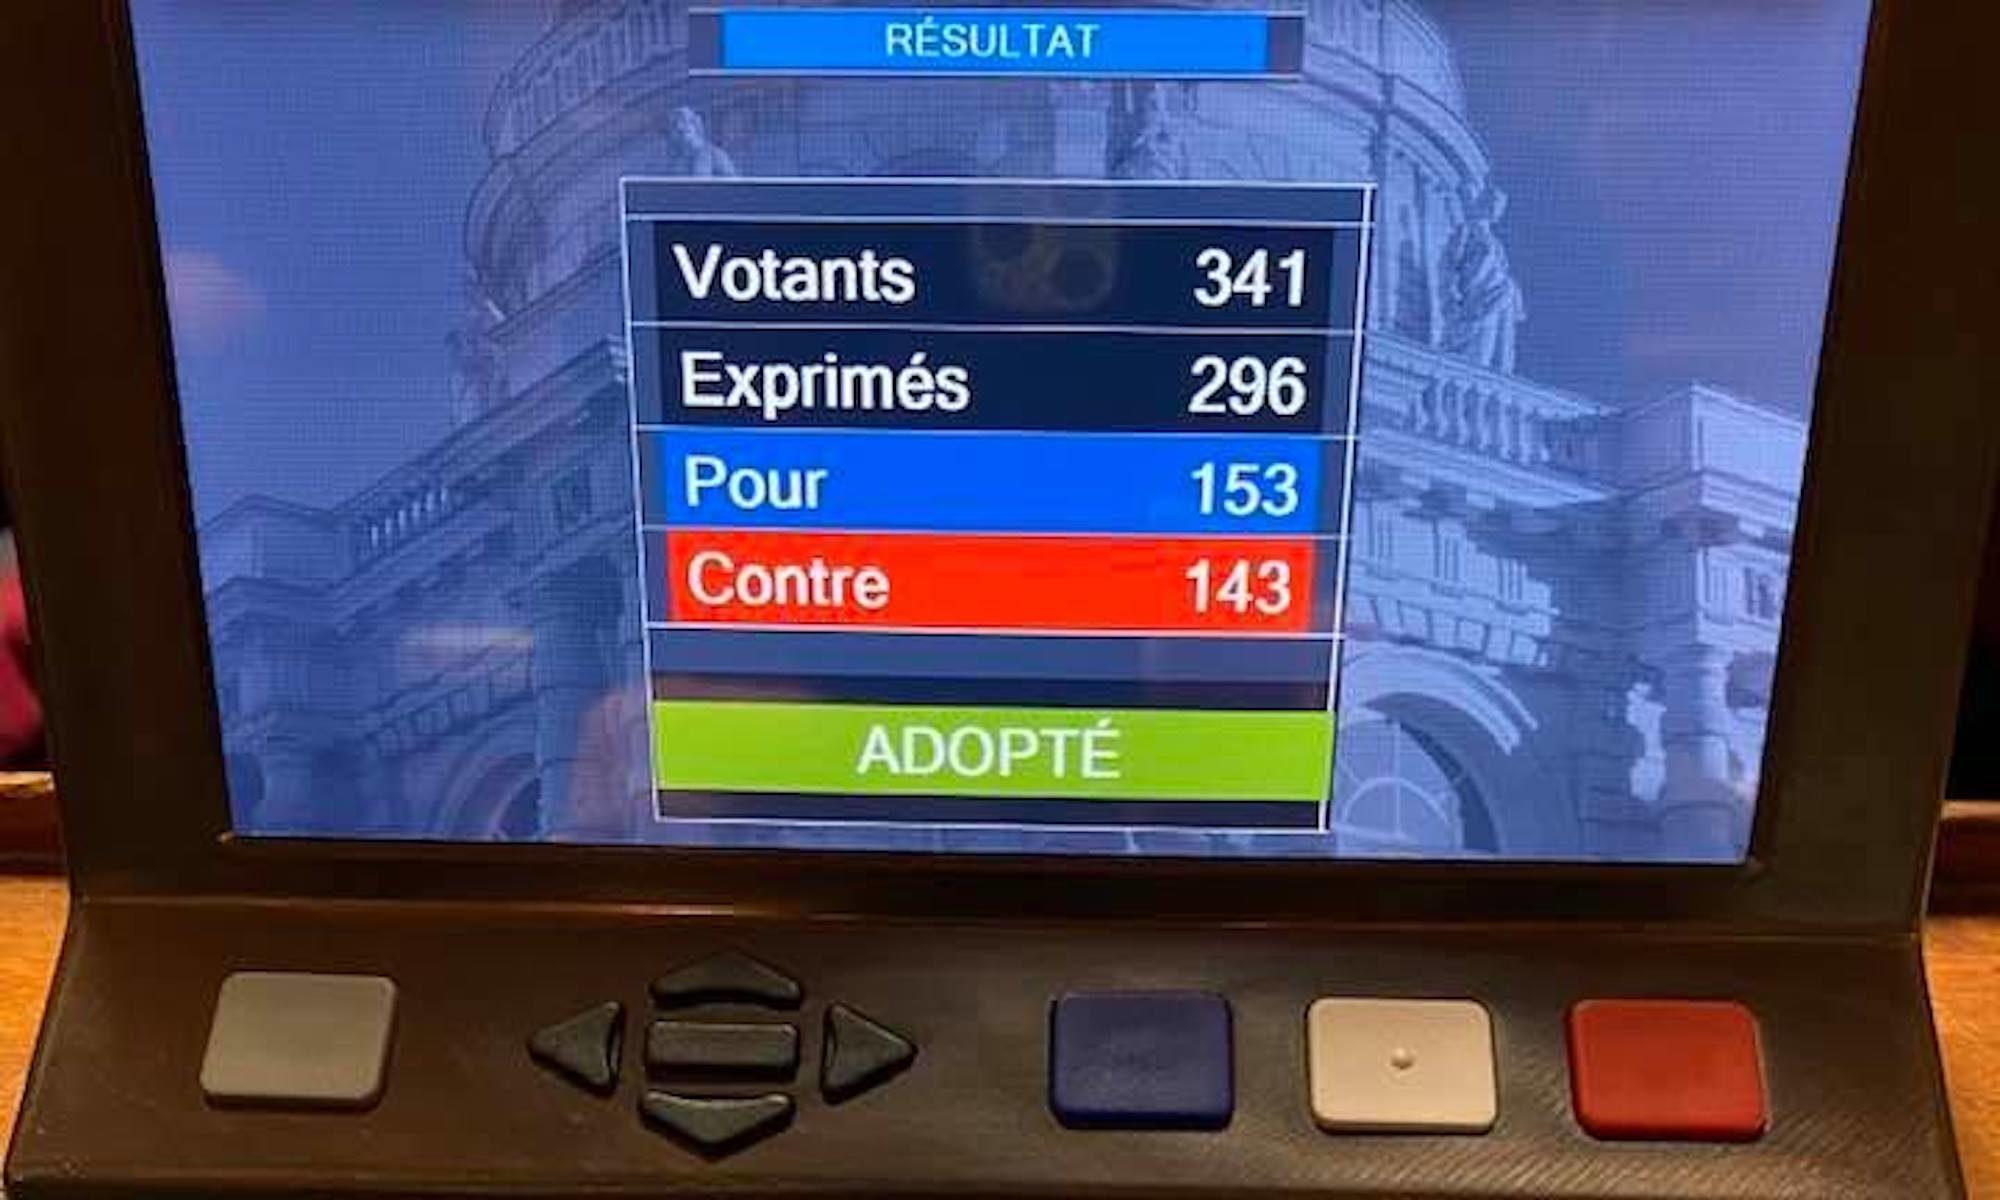 Vote scrutin solennel bioéthique 4 février 2020